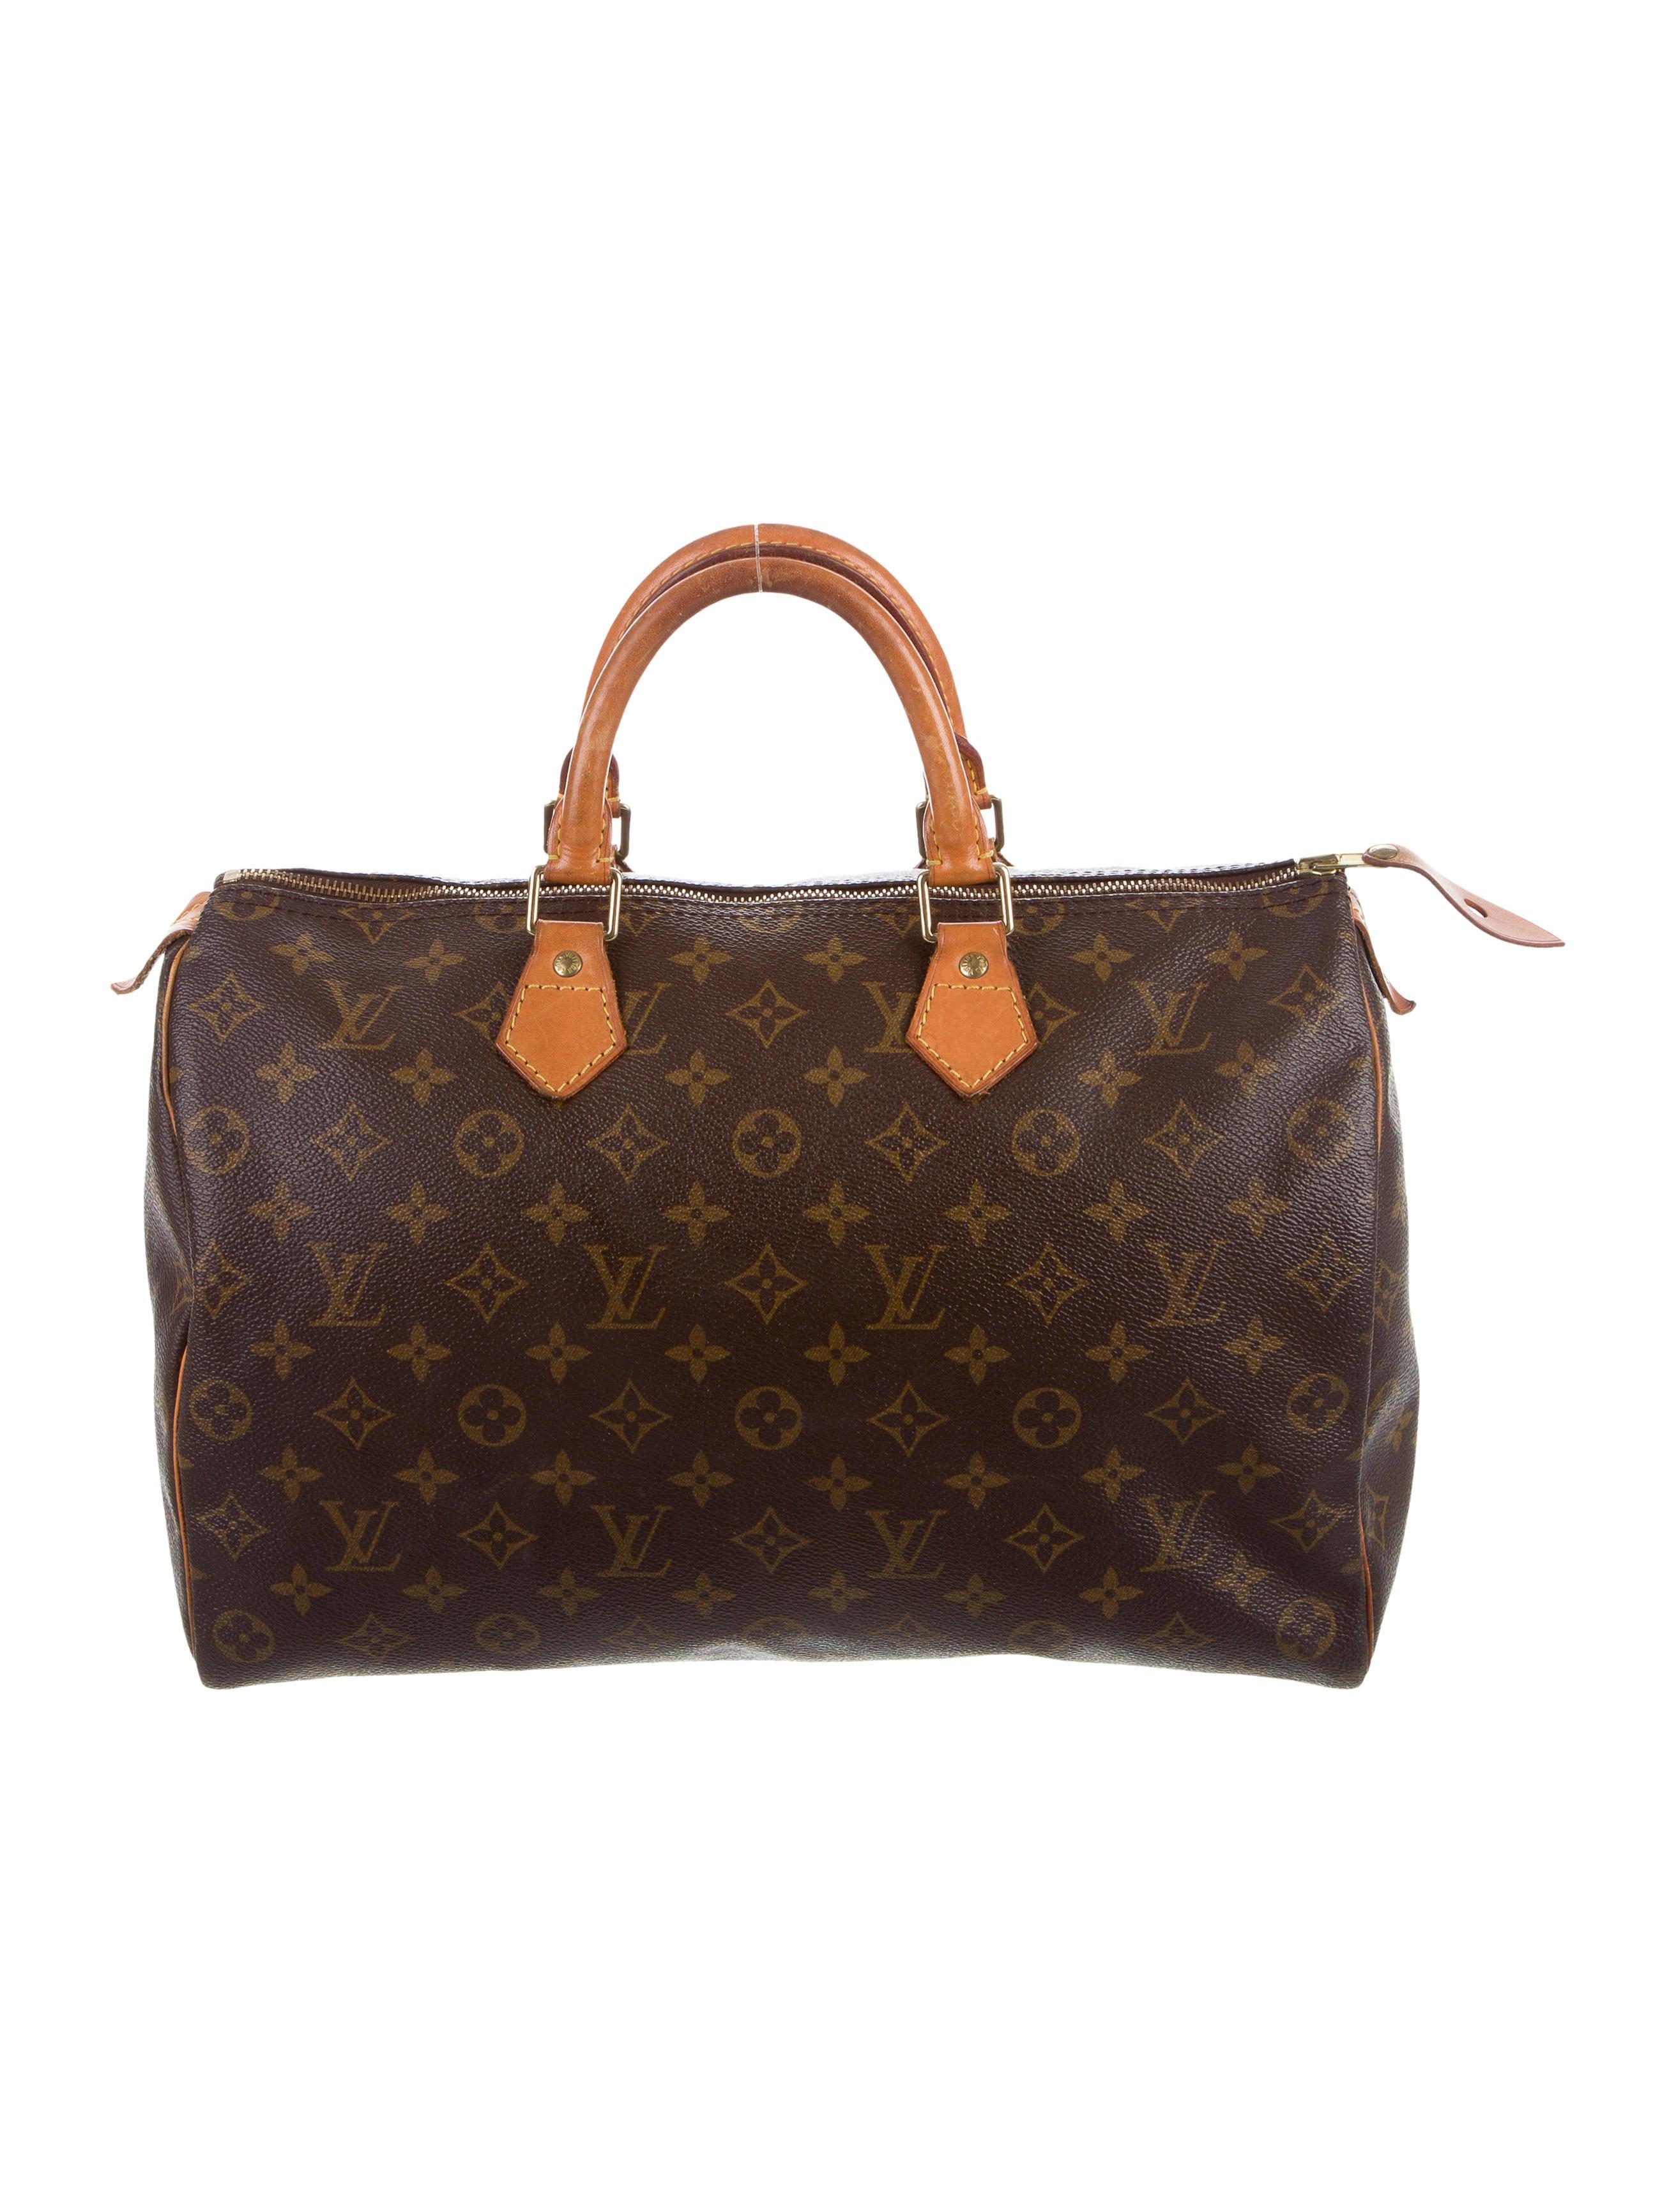 Louis vuitton monogram speedy 35 handbags lou118797 for Louis vuitton miroir speedy